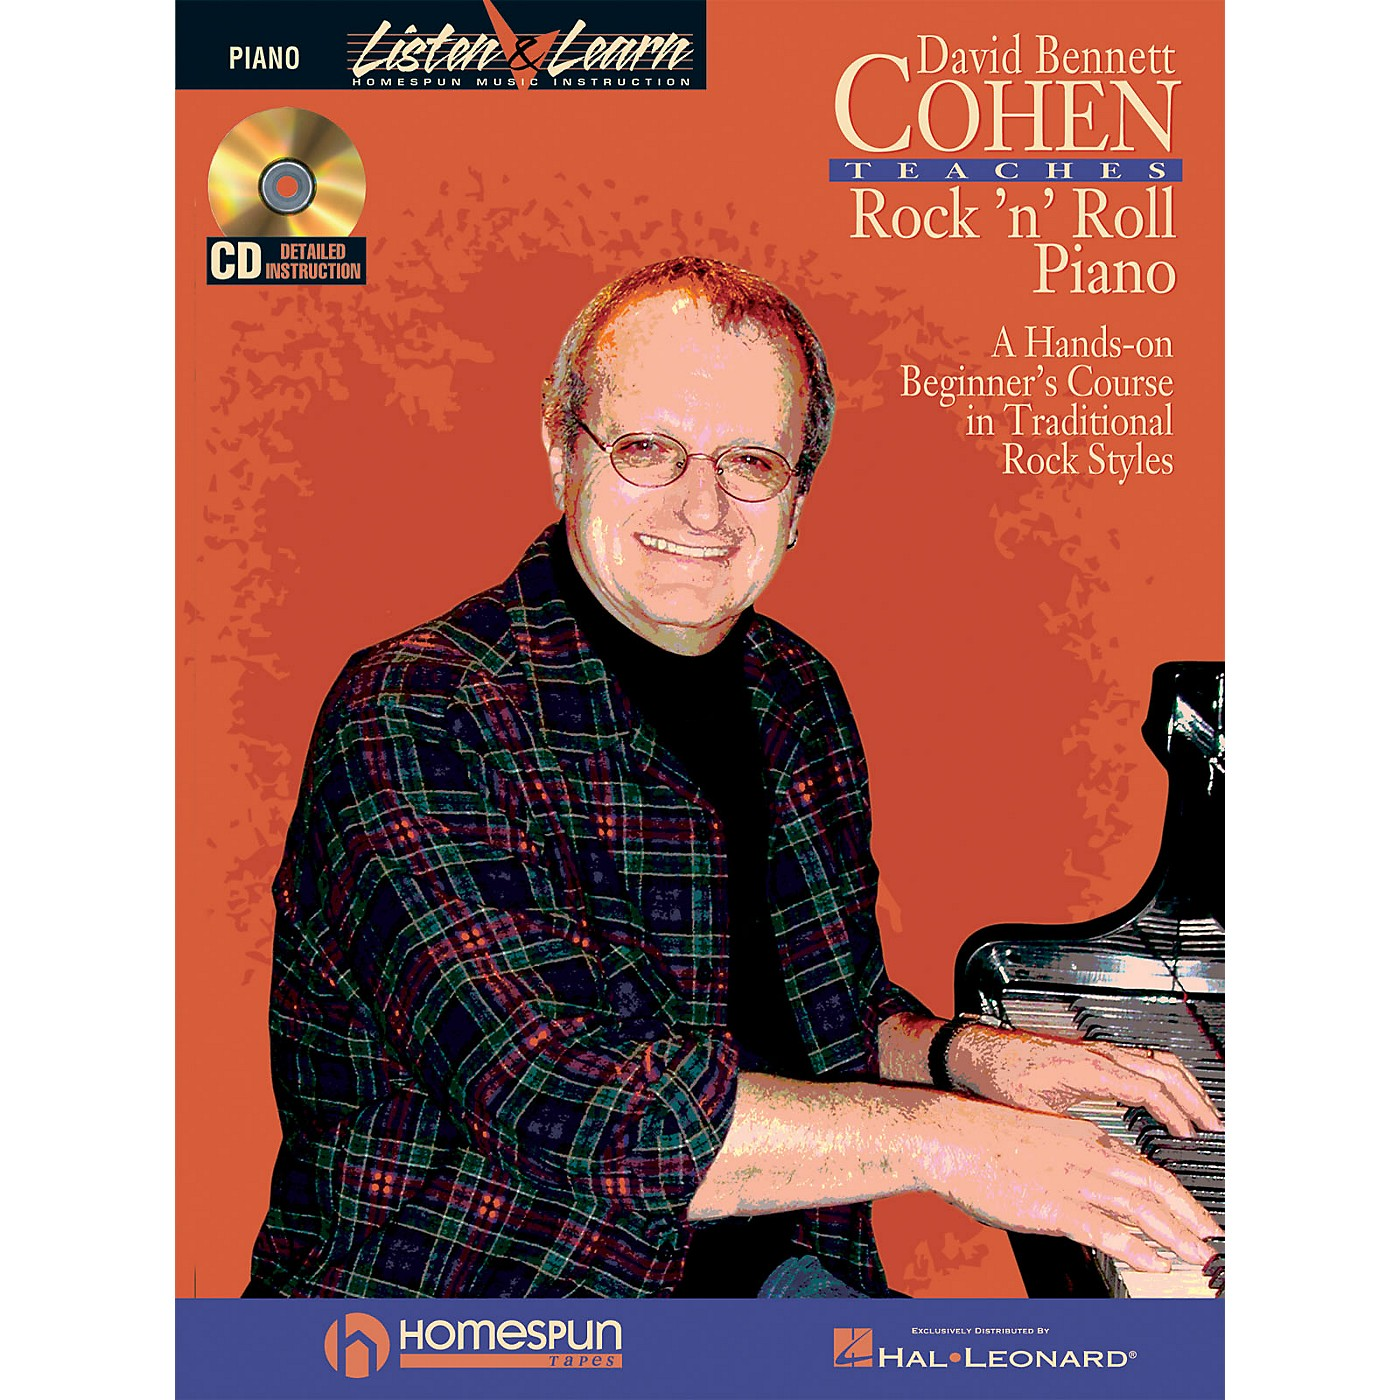 Homespun David Bennett Cohen Teaches Rock'n'Roll Piano Keyboard Instruction Softcover with CD by David Bennett Cohen thumbnail